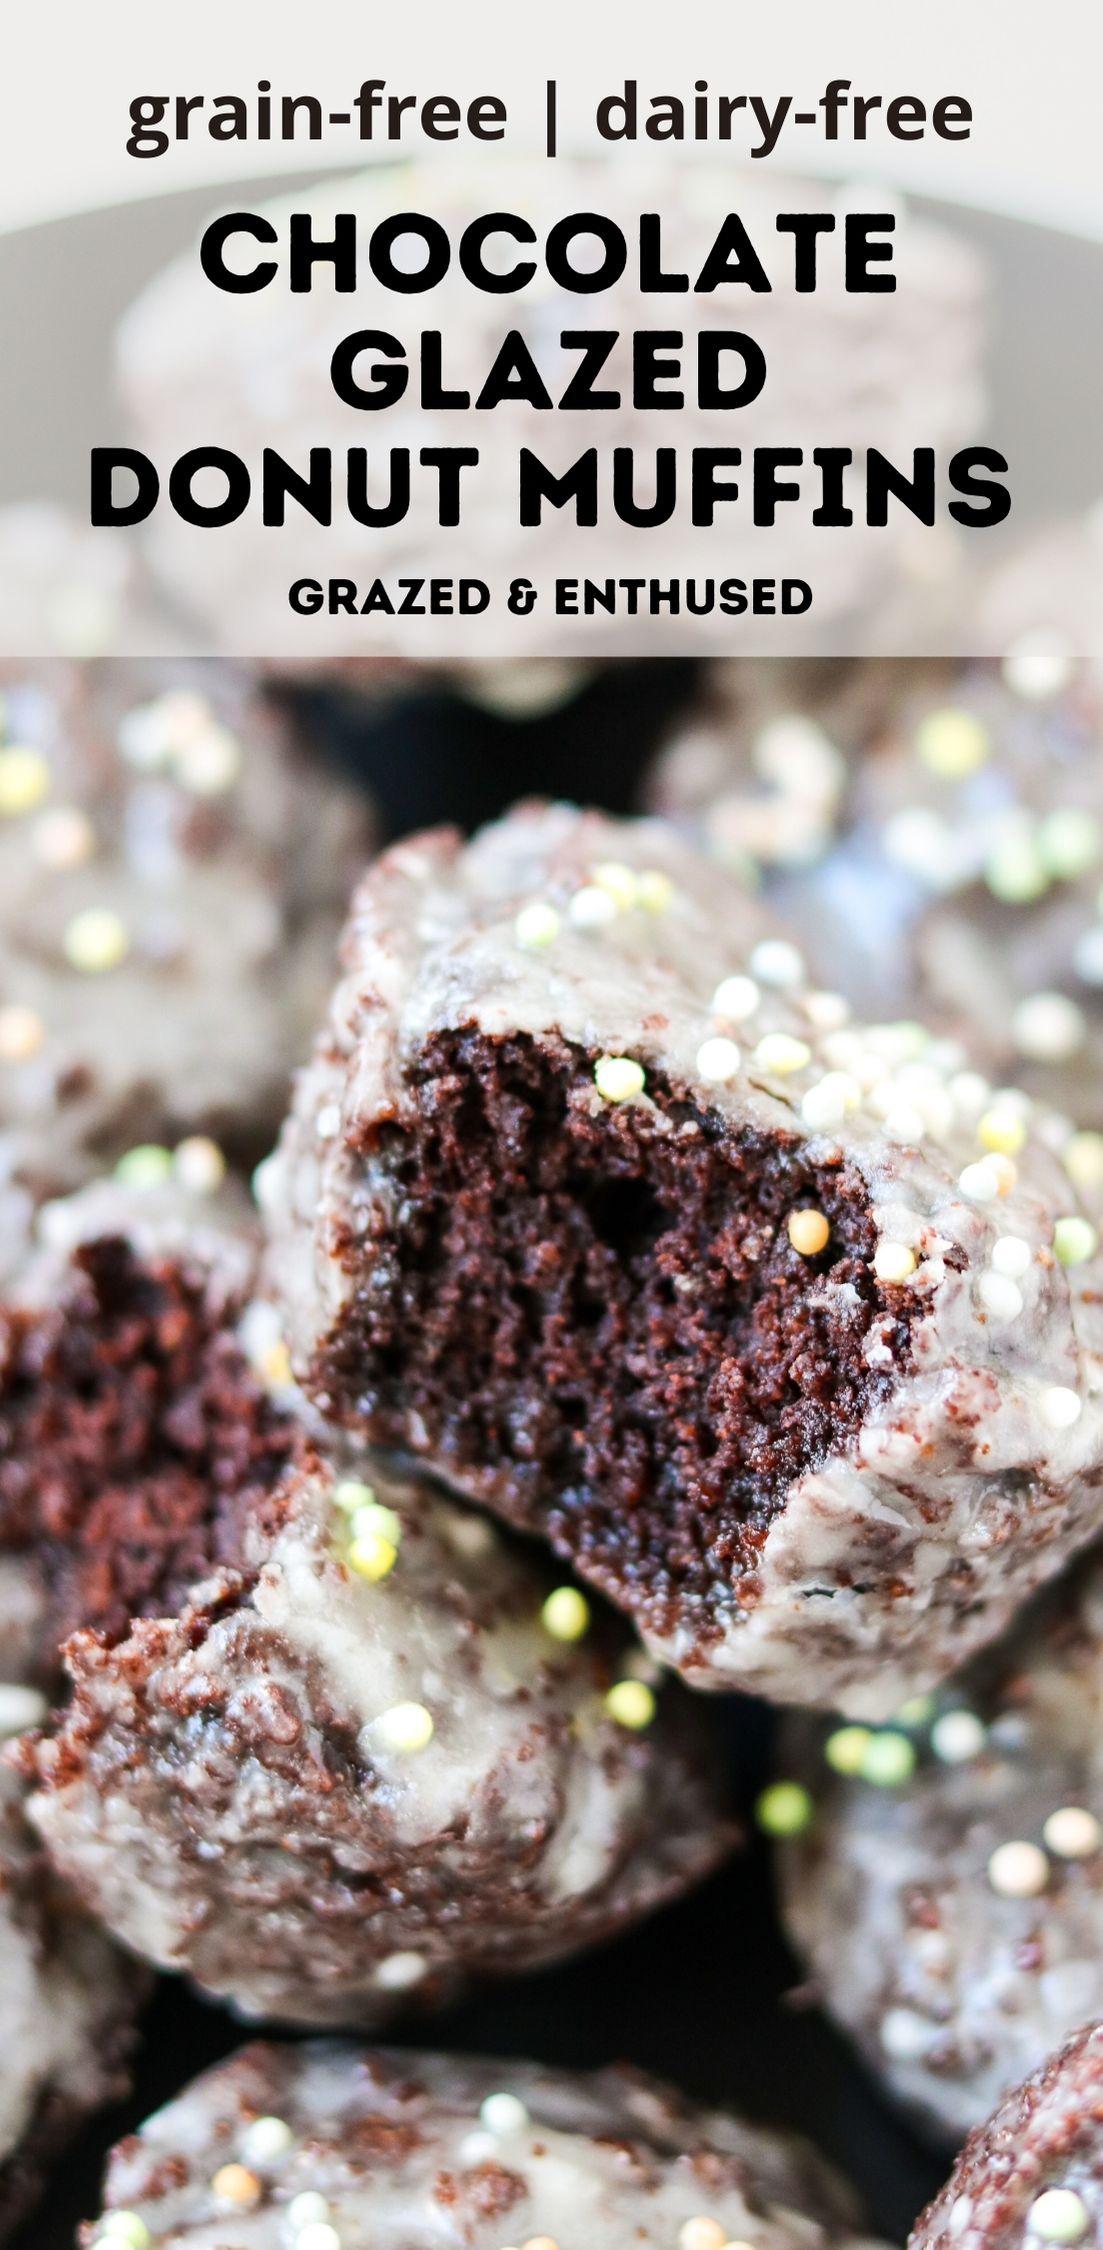 Grain-Free Chocolate Glazed Donut Muffins